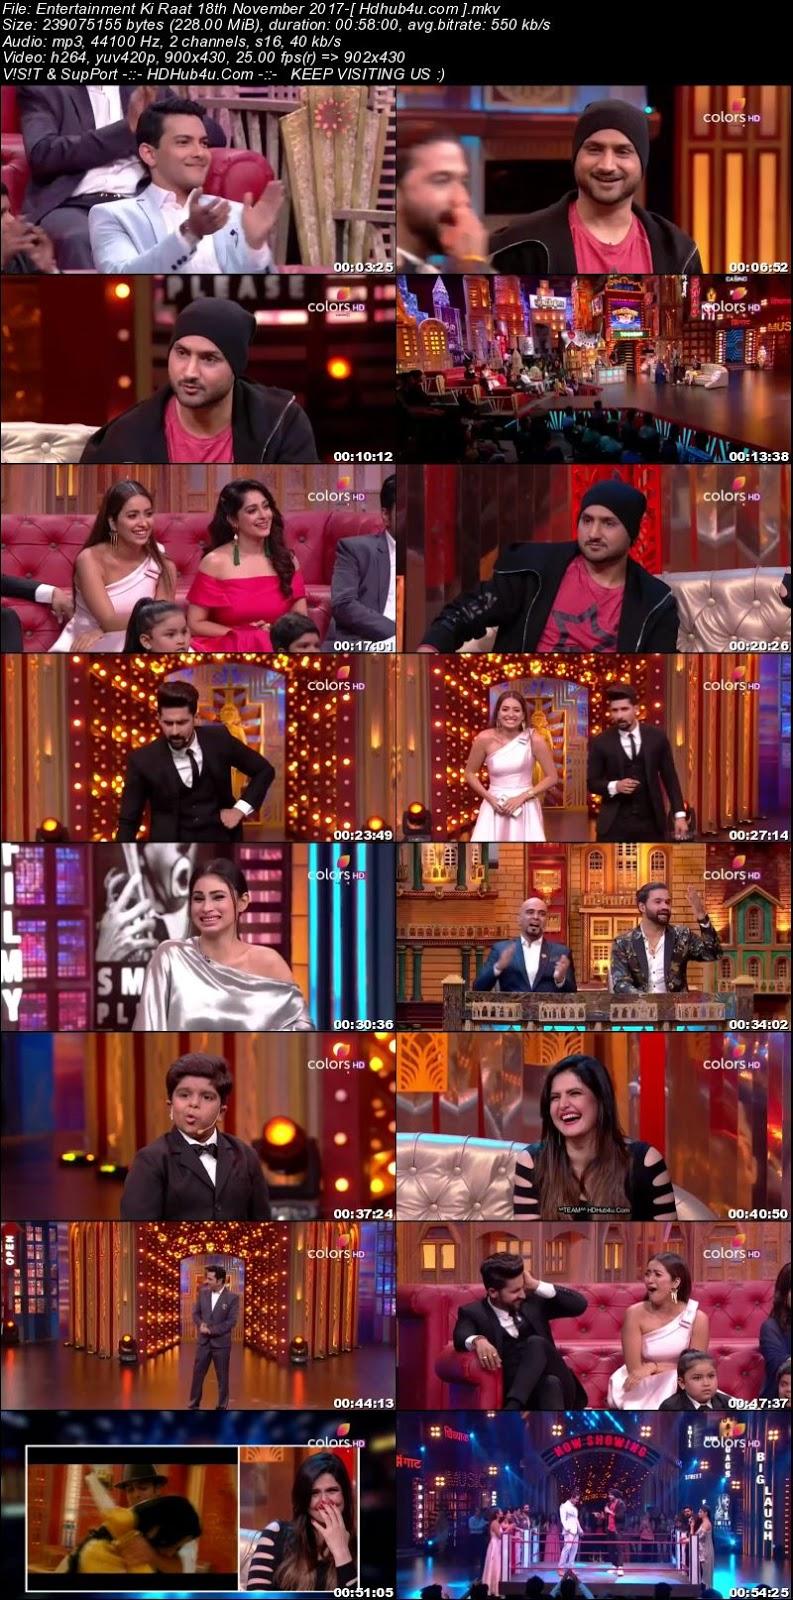 Entertainment Ki Raat 18th November 2017 480p HDTV 200MB Download